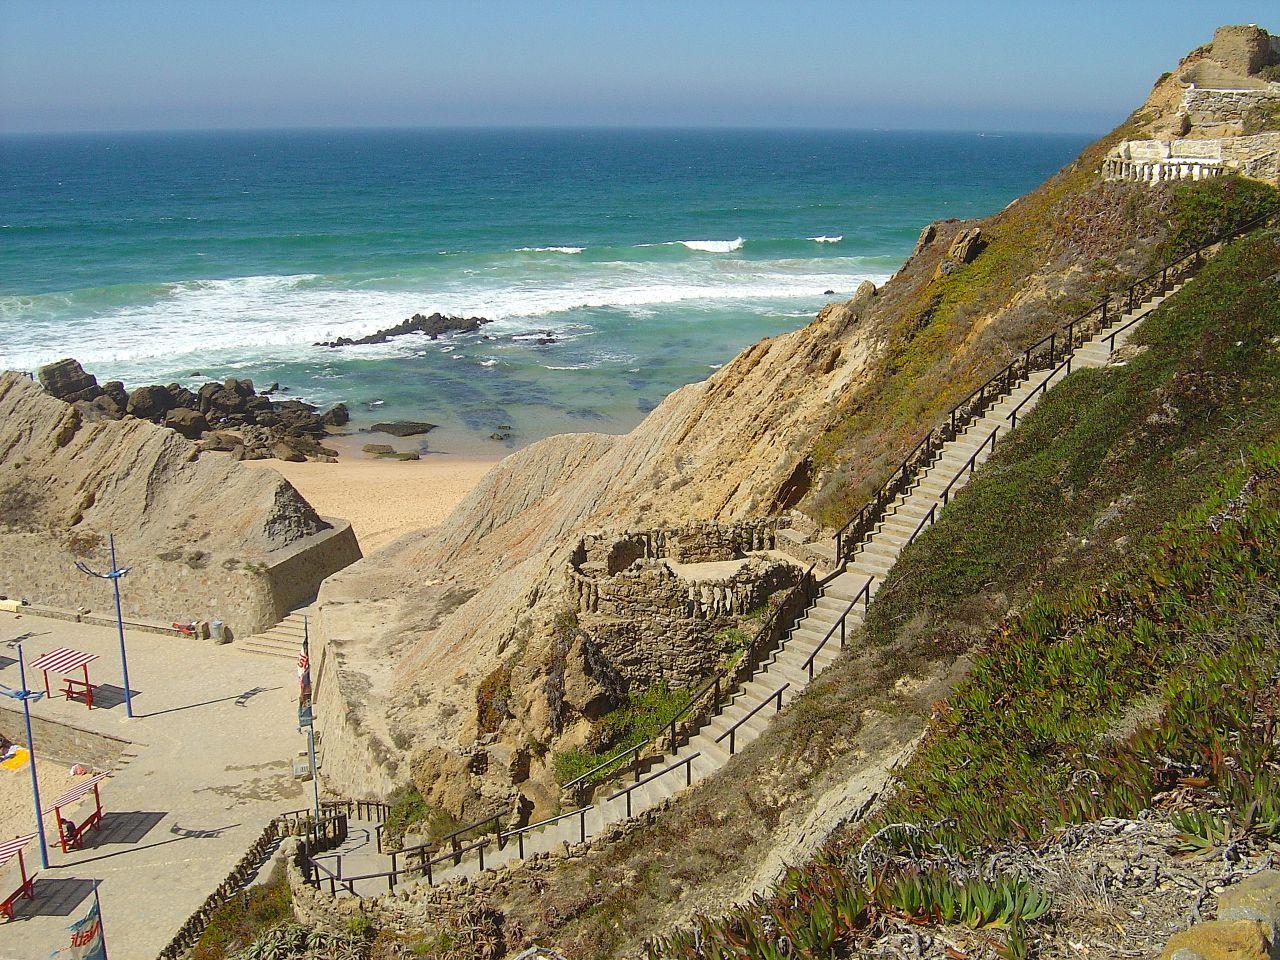 File:Praia Formosa - Portugal (408082426).jpg - Wikimedia Commons